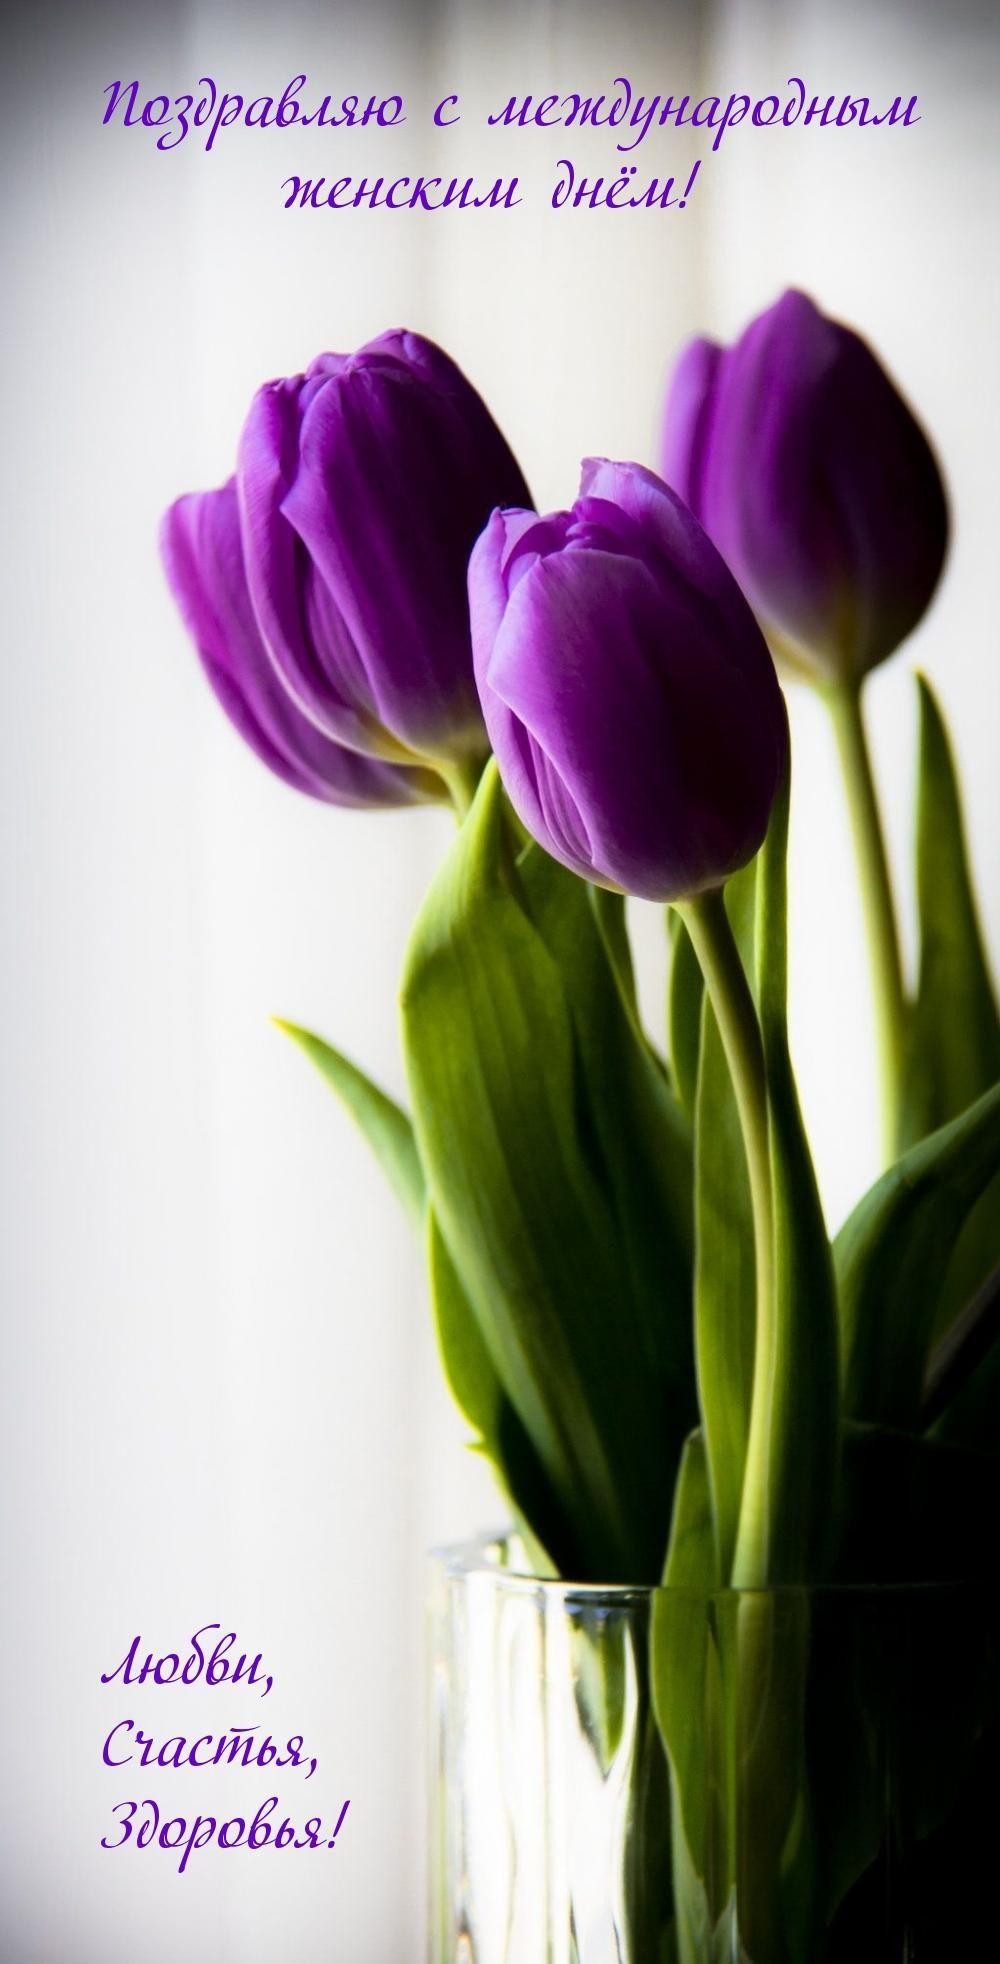 З 8 березня картинки / фото imagetext.ru